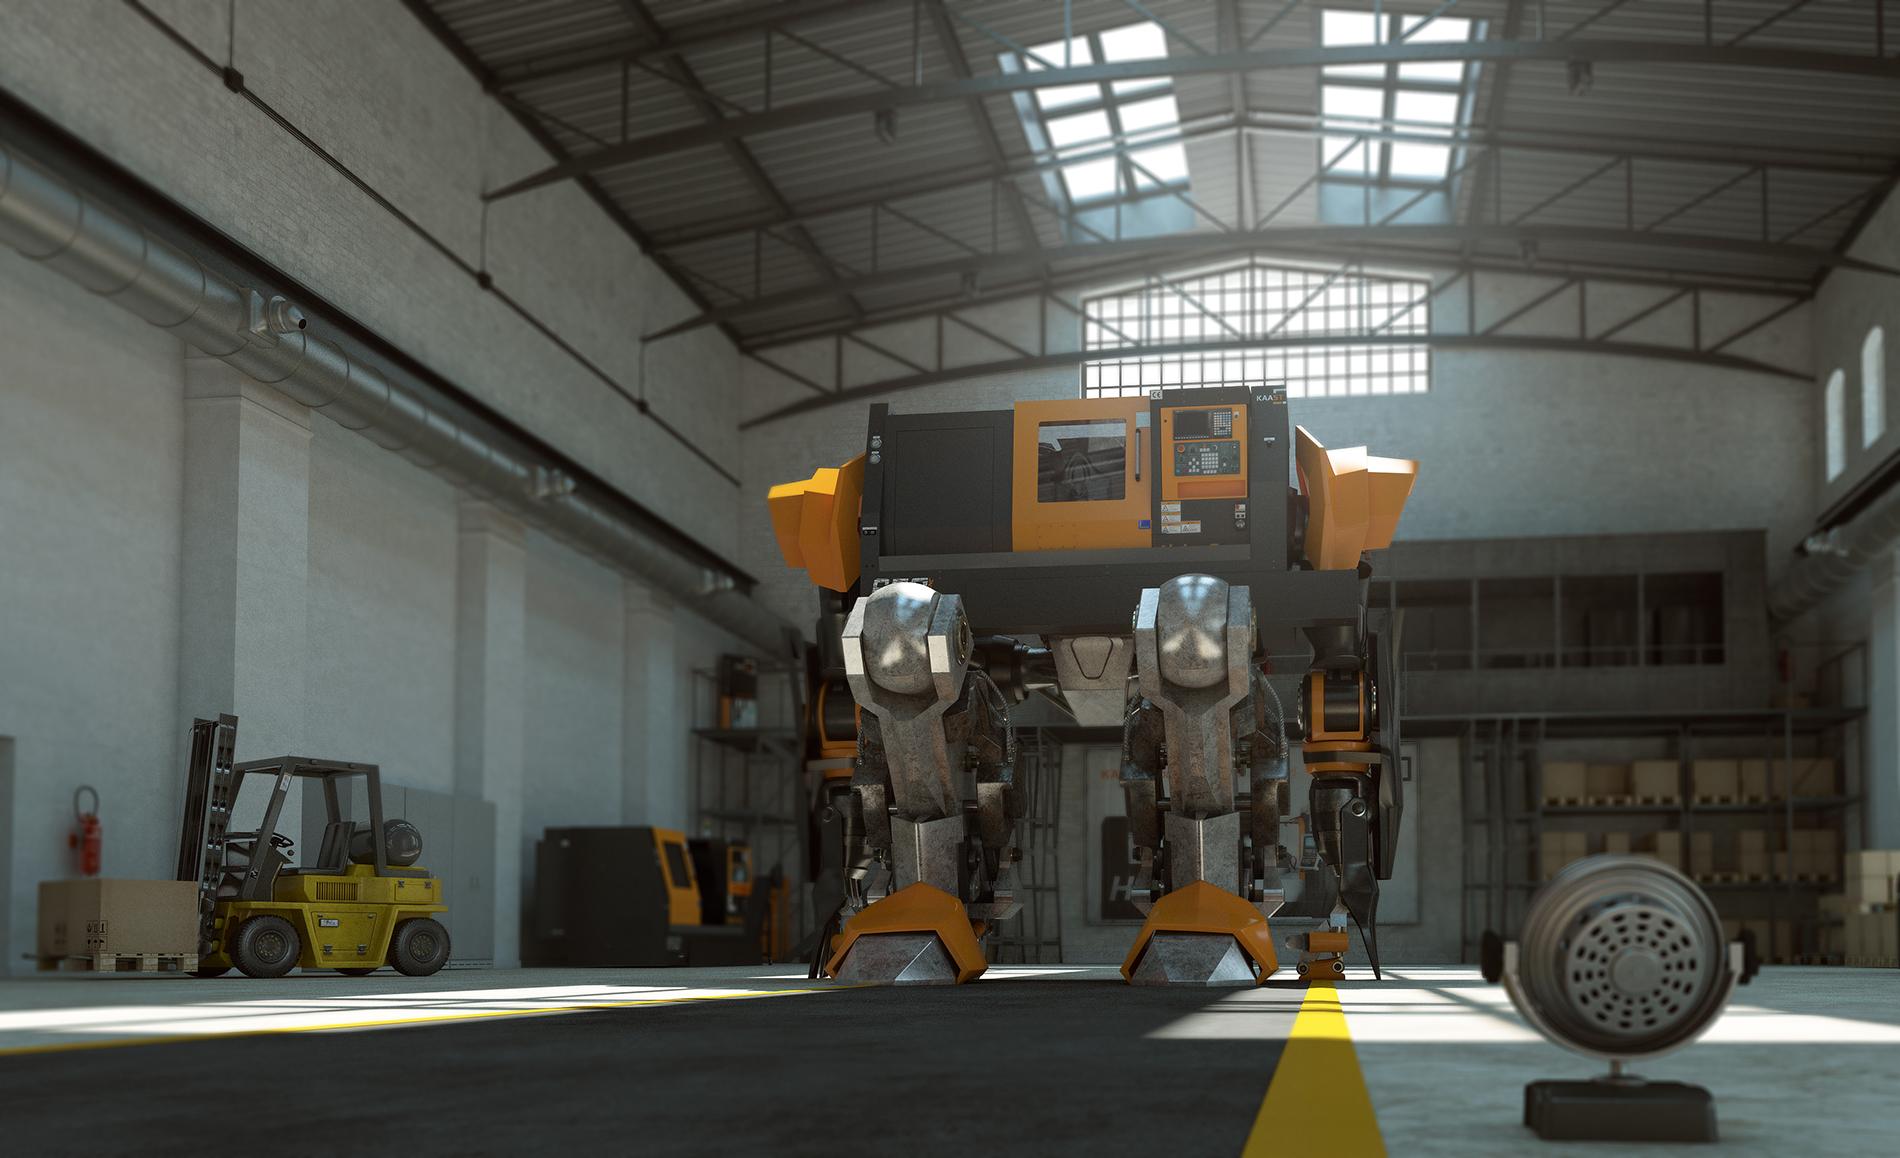 3d animation transformer CNC